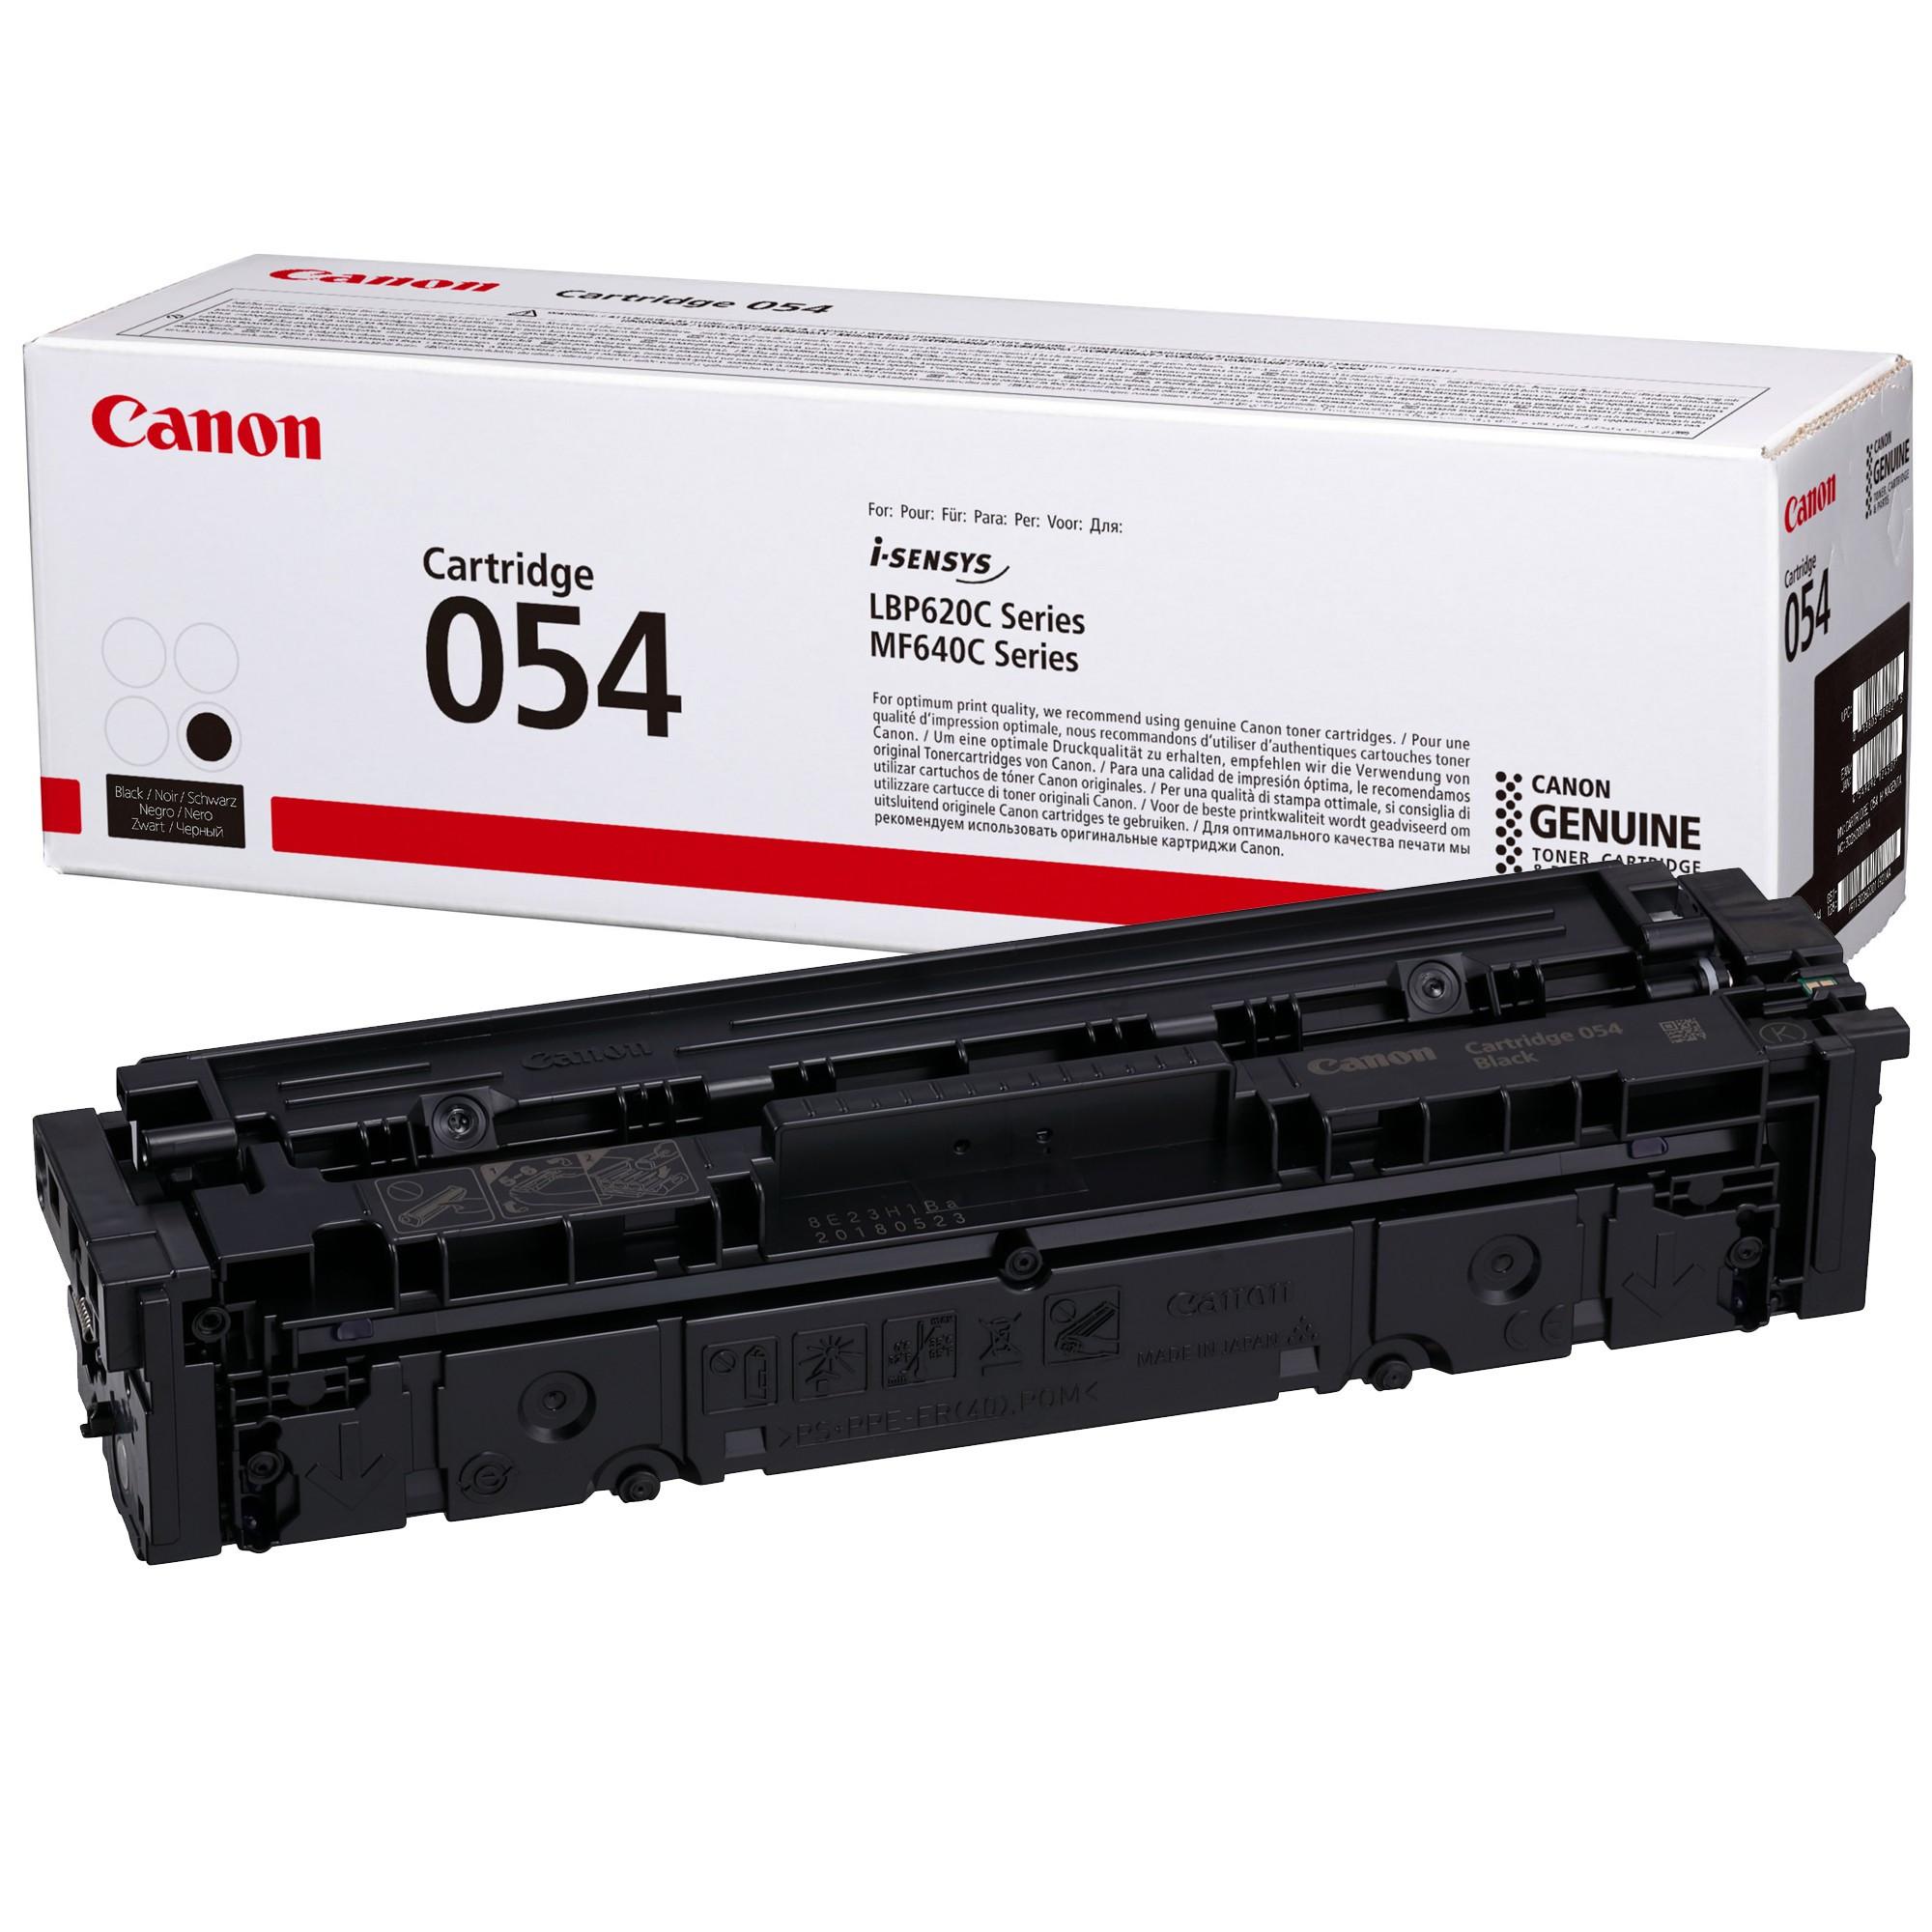 Canon CRG054 Toner - festékkazetta 1,5K fekete (Black), eredeti